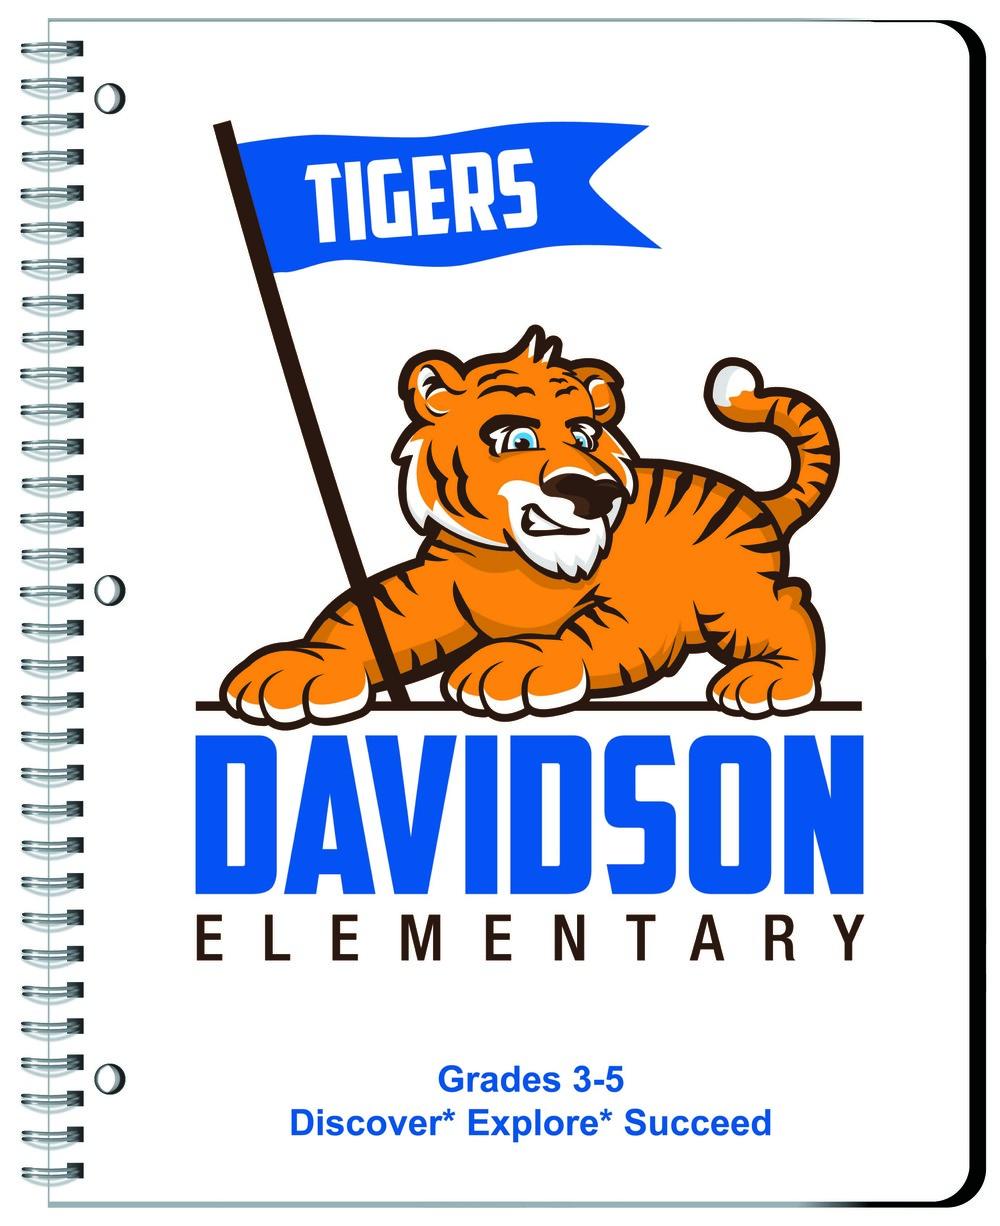 Davidson Elementary